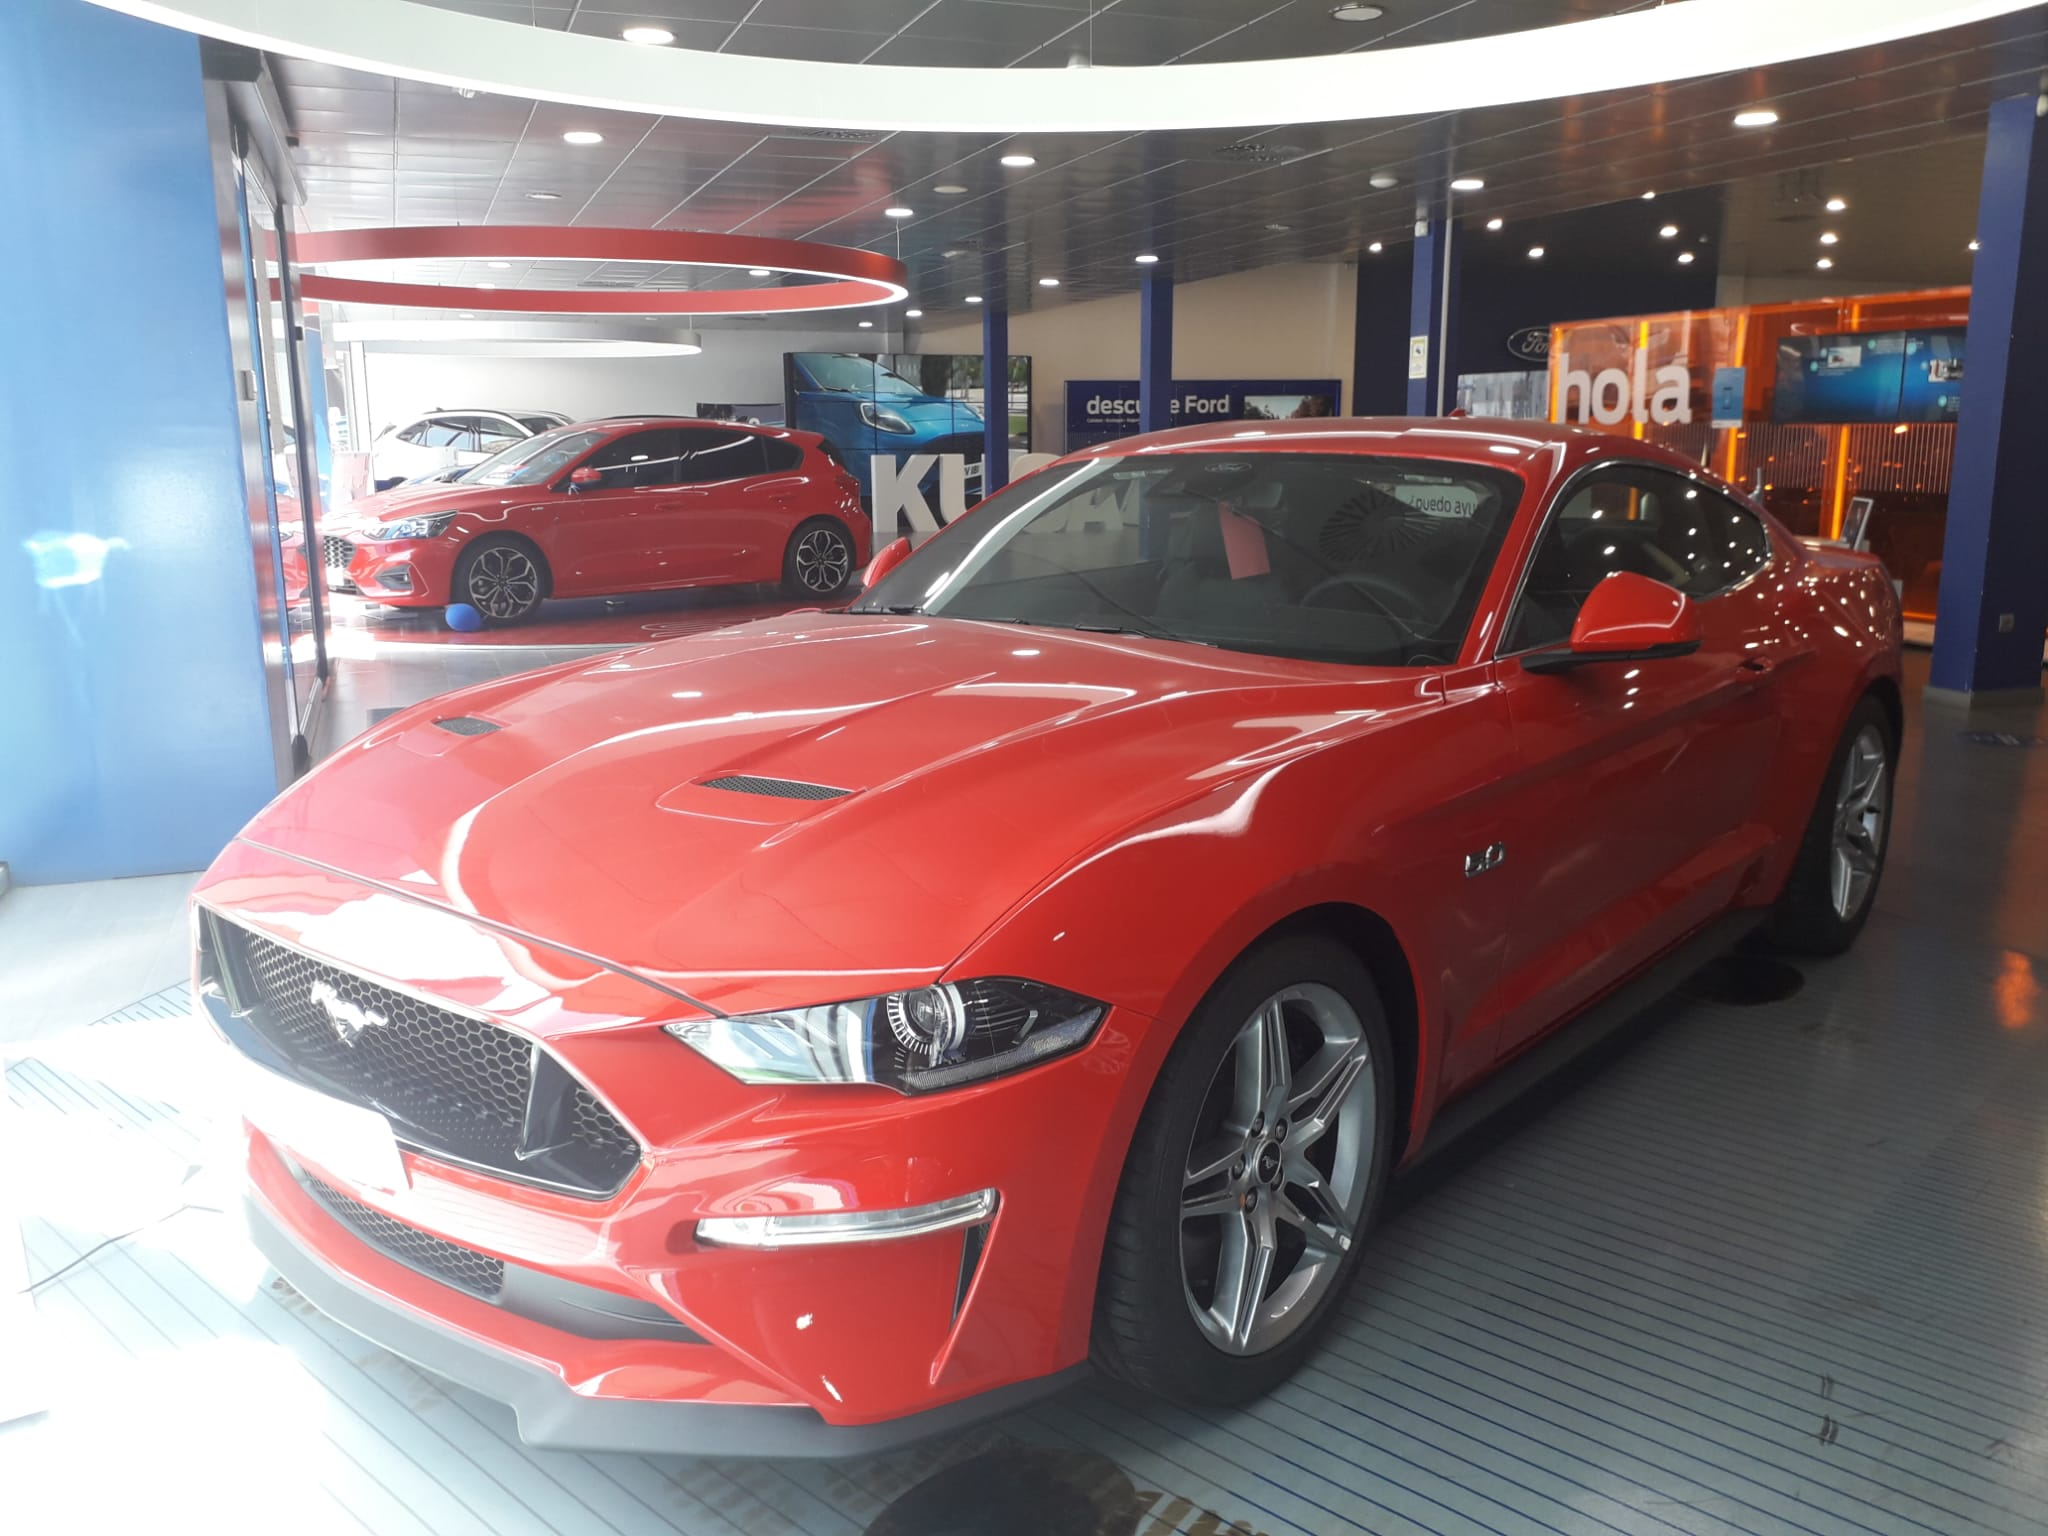 Ford Mustang ocasión segunda mano 2021 Gasolina por 48.500€ en Málaga